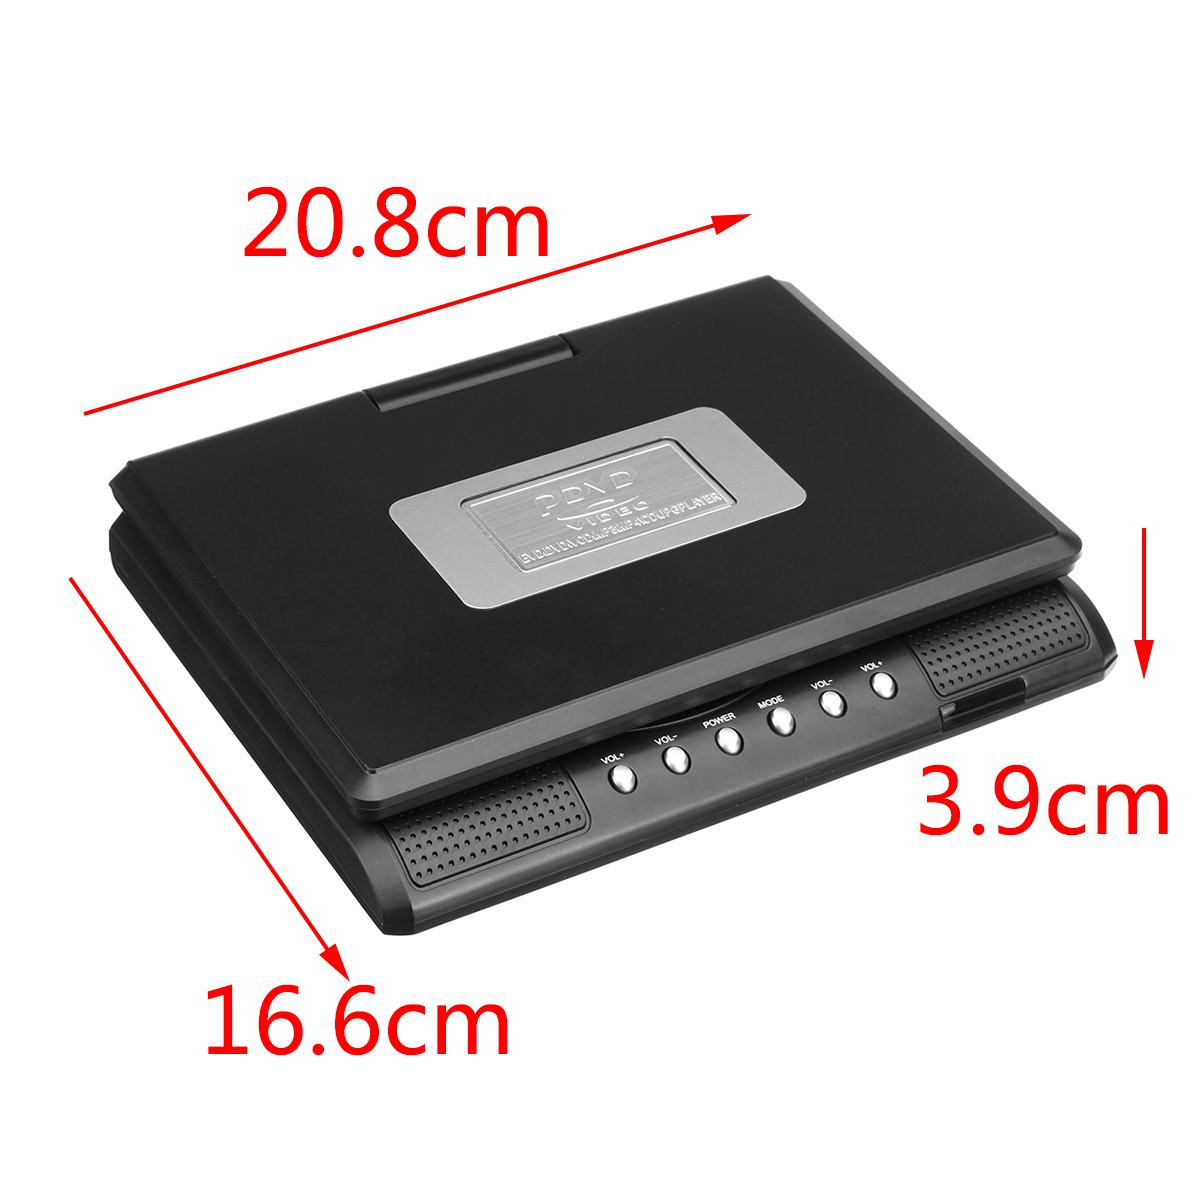 Portátil de 7,8 pulgadas HD TV casa coche reproductor de DVD VCD CD MP3 DVD USB SD reproductor de tarjetas RCA TV Portatil juego de Cable 16:9 pantalla LCD giratoria - 5